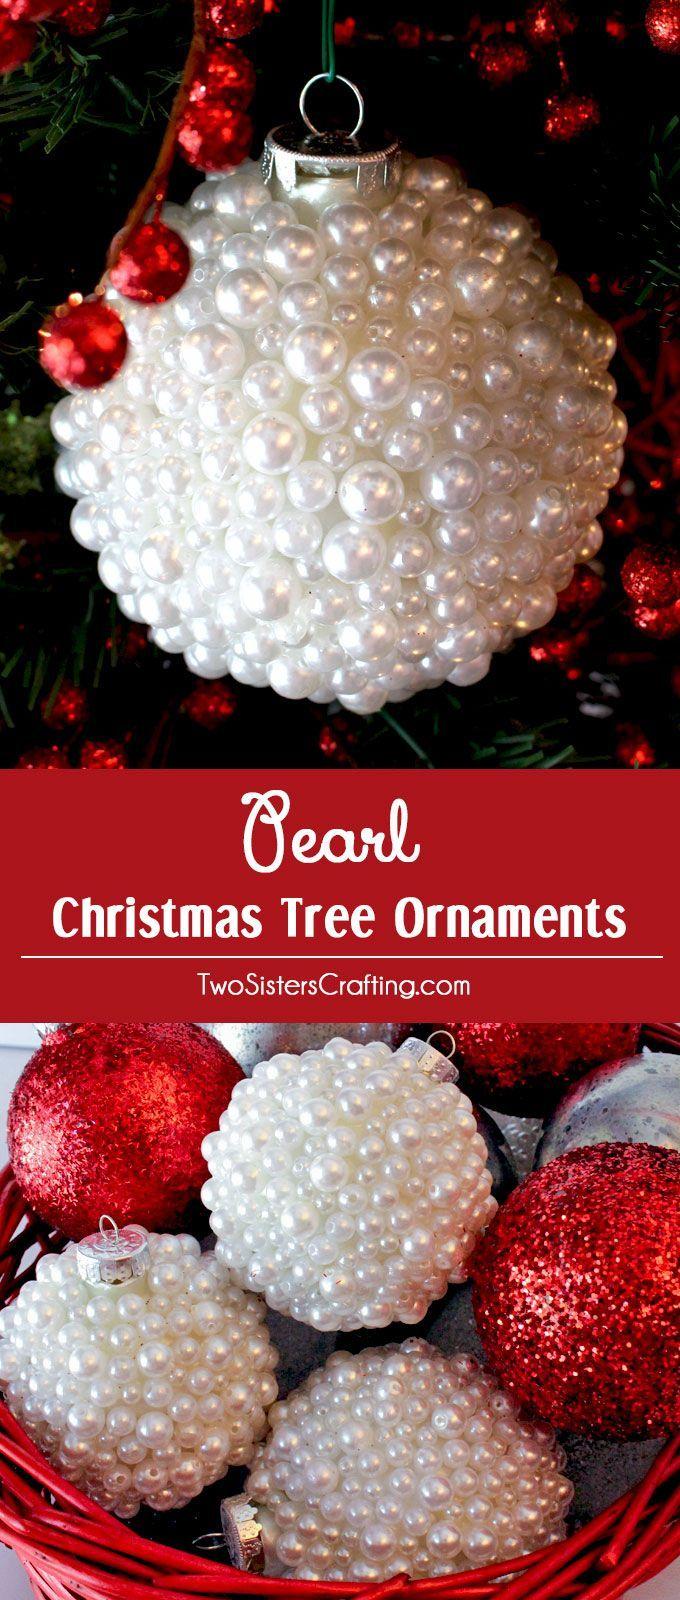 Pearl Christmas Tree Ornaments | Χριστούγεννα και Κατασκευές